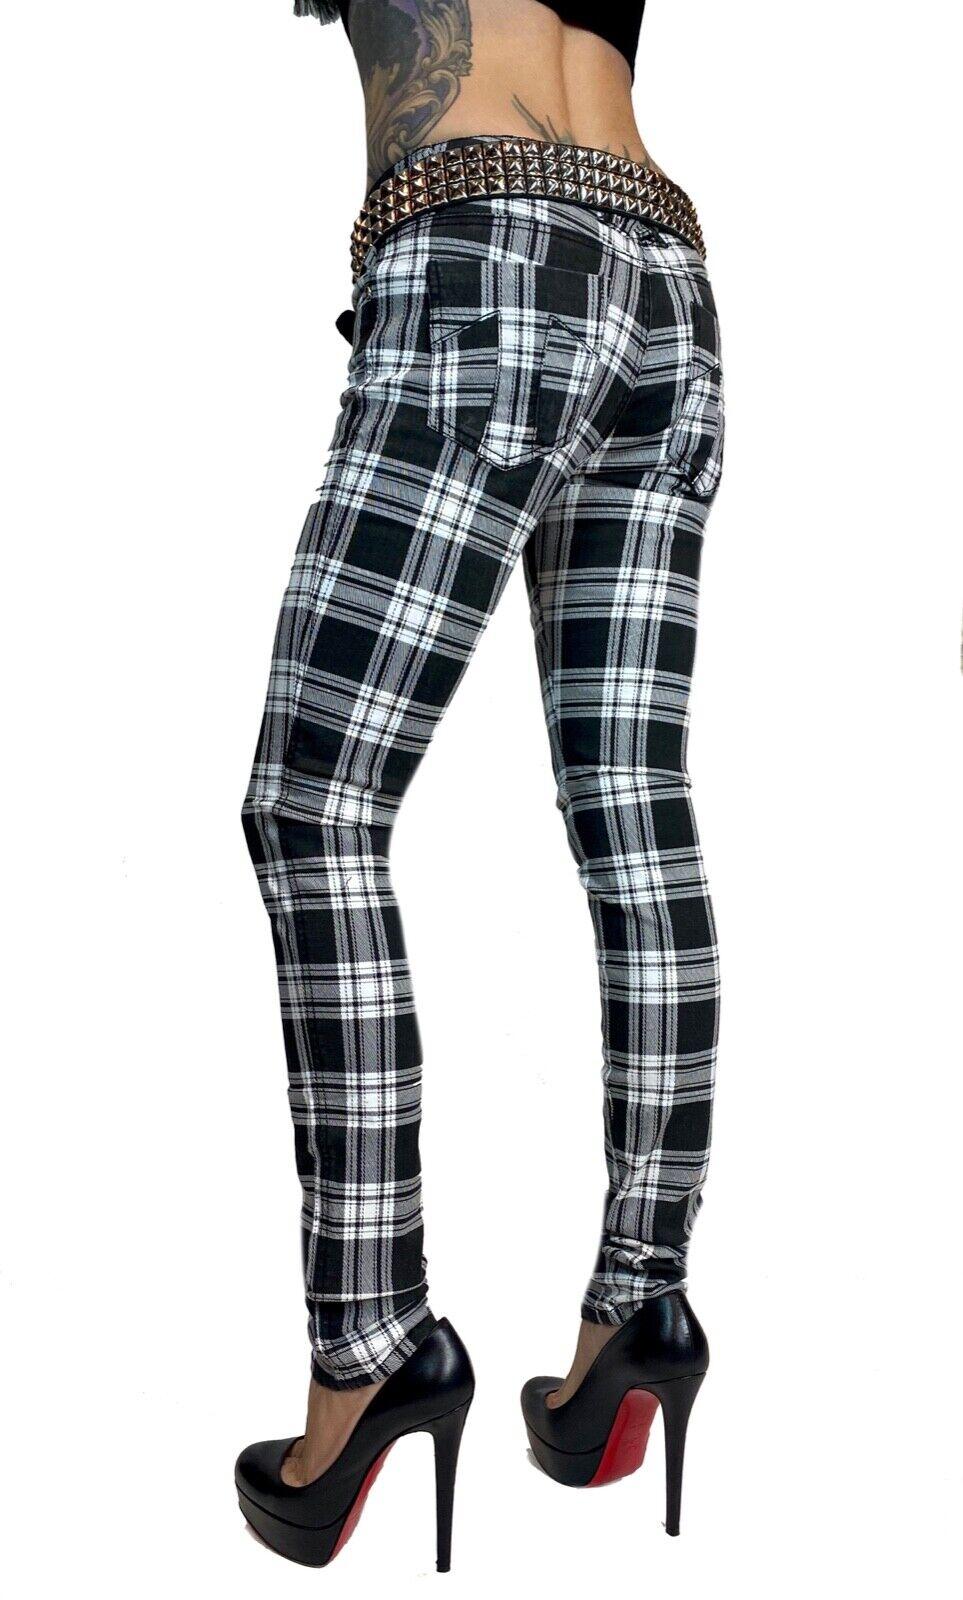 TRIPP BLACK WHITE PLAID 80S ROCK STAR SKINNY JEAN PANTS MOTO METAL PUNK IS6235P Clothing, Shoes & Accessories